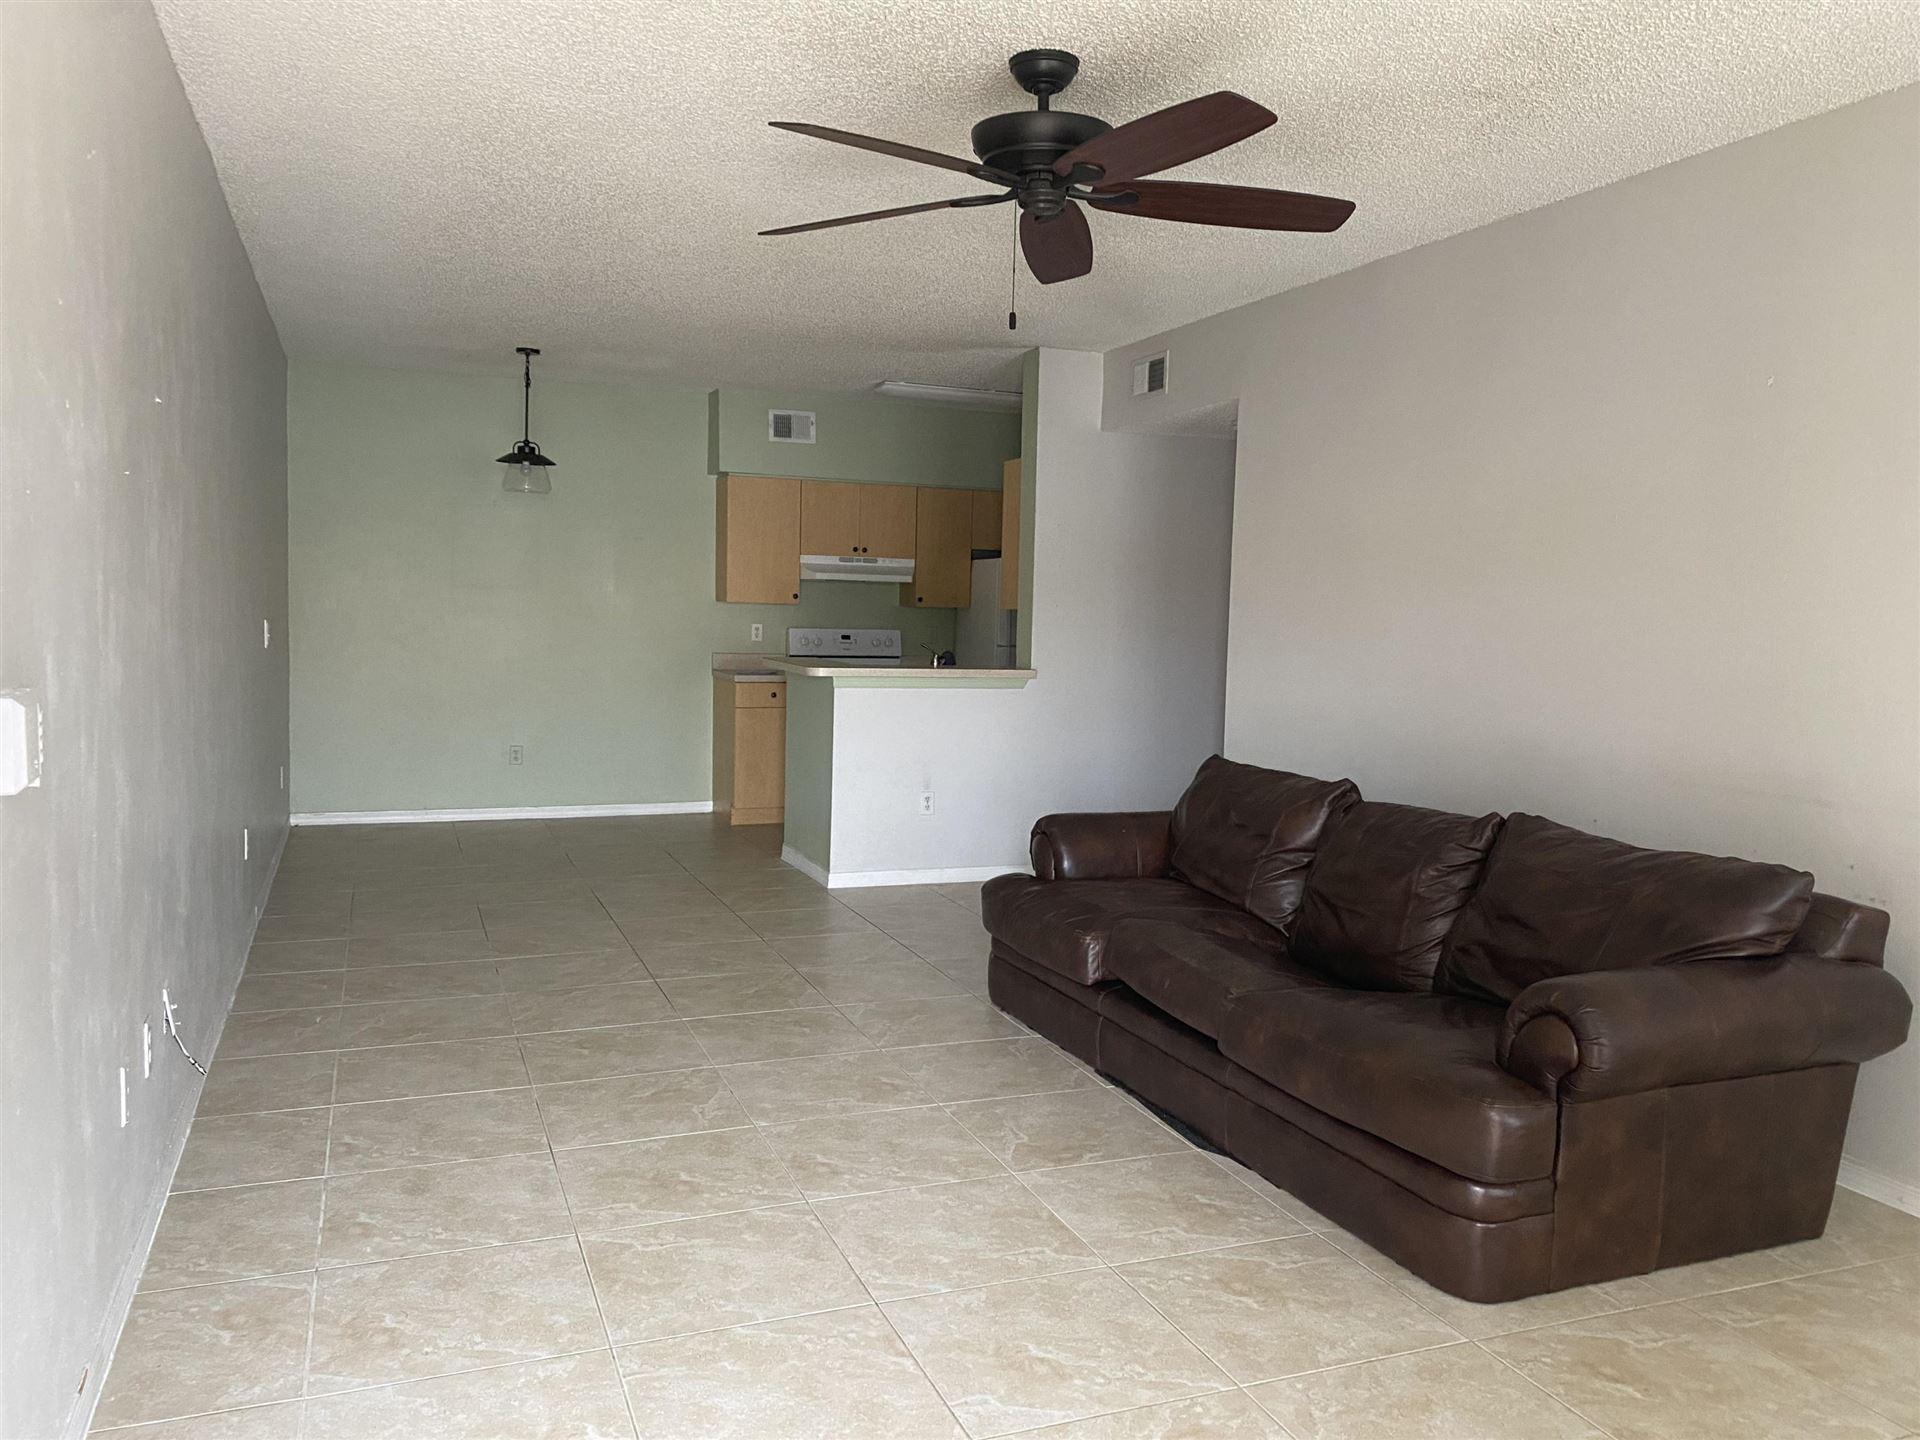 10342 Fox Trail Road S #1401, West Palm Beach, FL 33411 - MLS#: RX-10722242